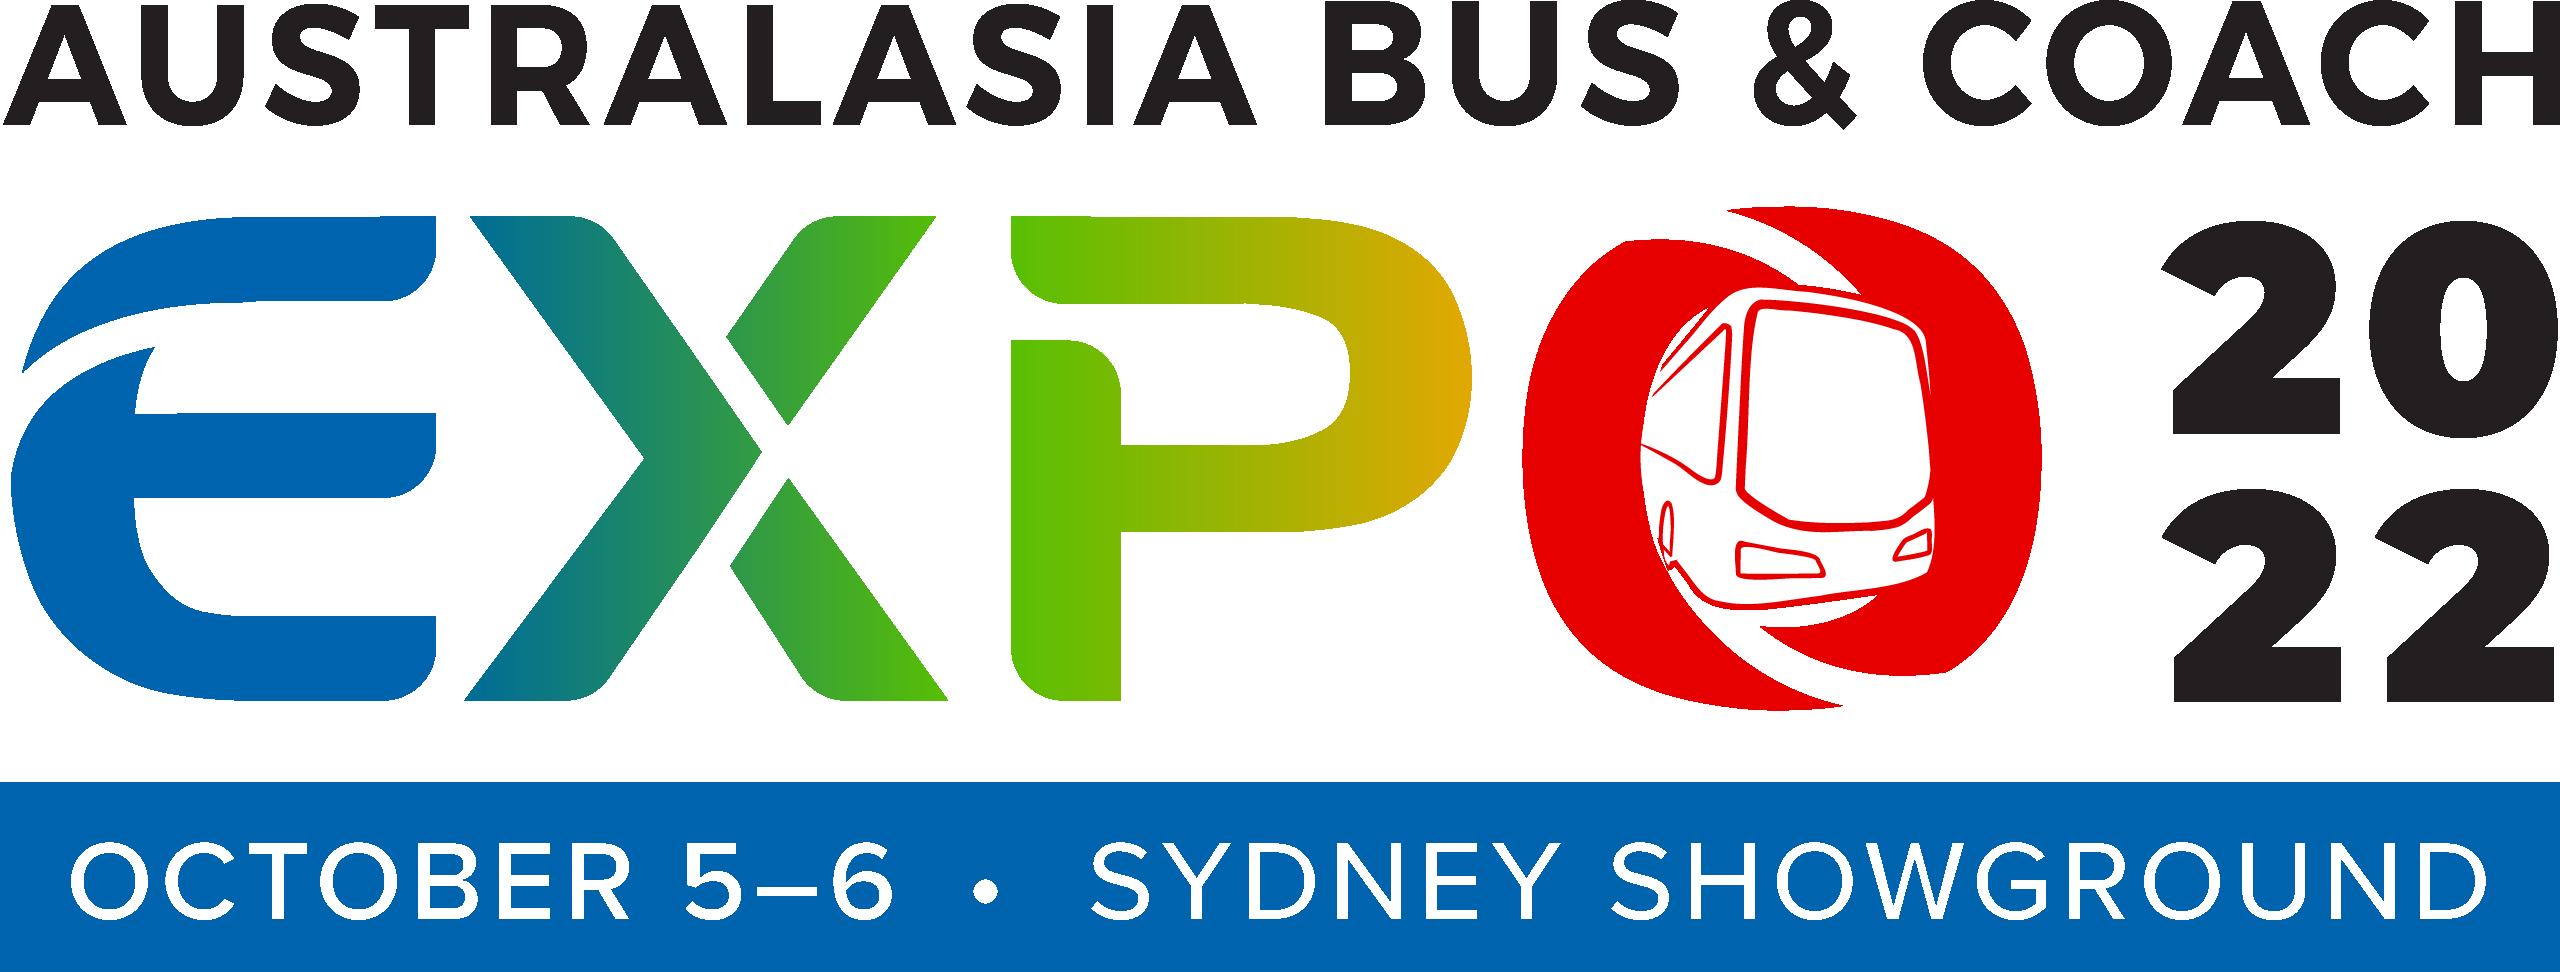 Australasia Bus and Coach Expo 2022